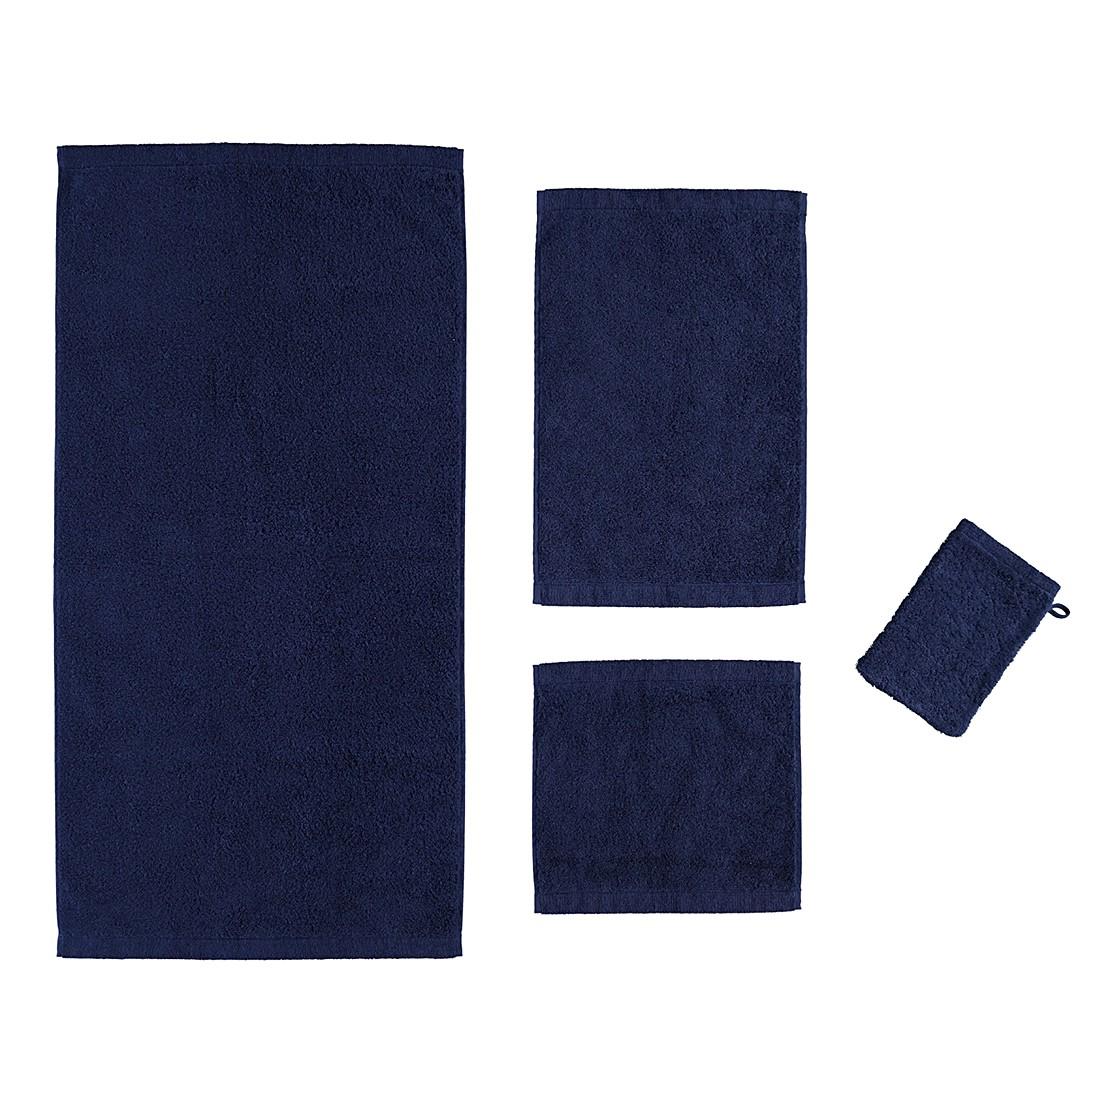 handt cher life style jacquard 7062 baumwolle kiesel handtuch 50x100 cm caw g nstig. Black Bedroom Furniture Sets. Home Design Ideas